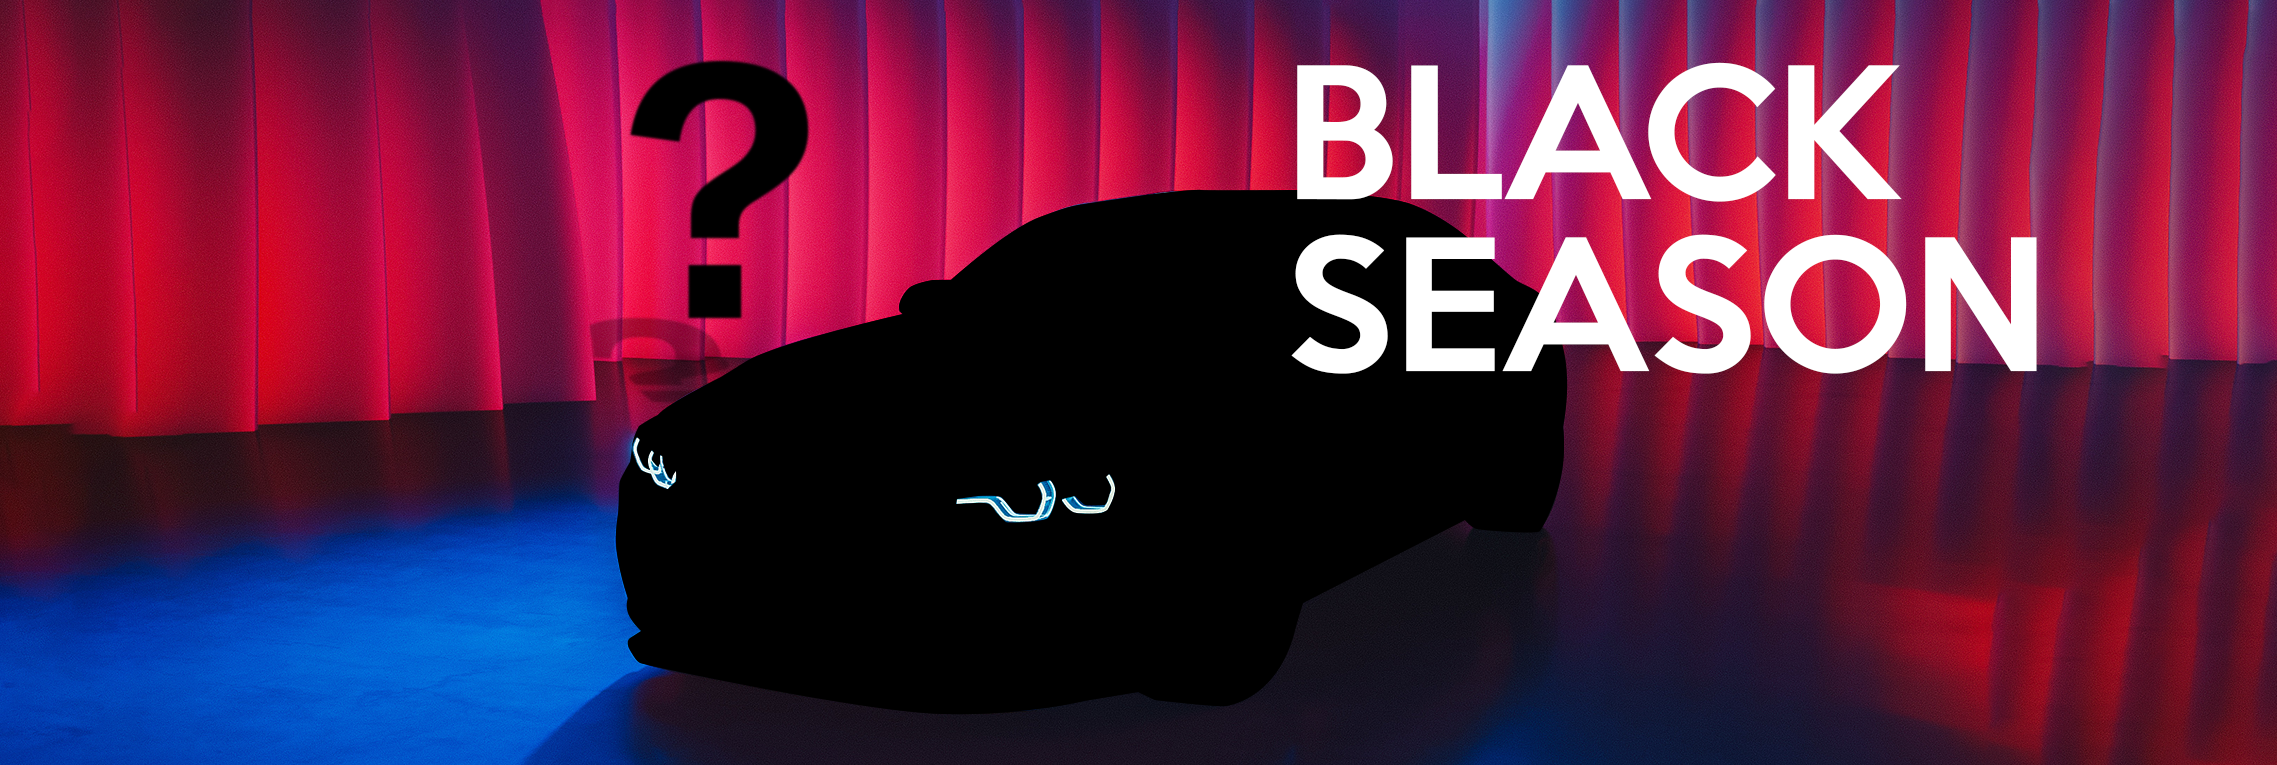 Black Season Slider 2